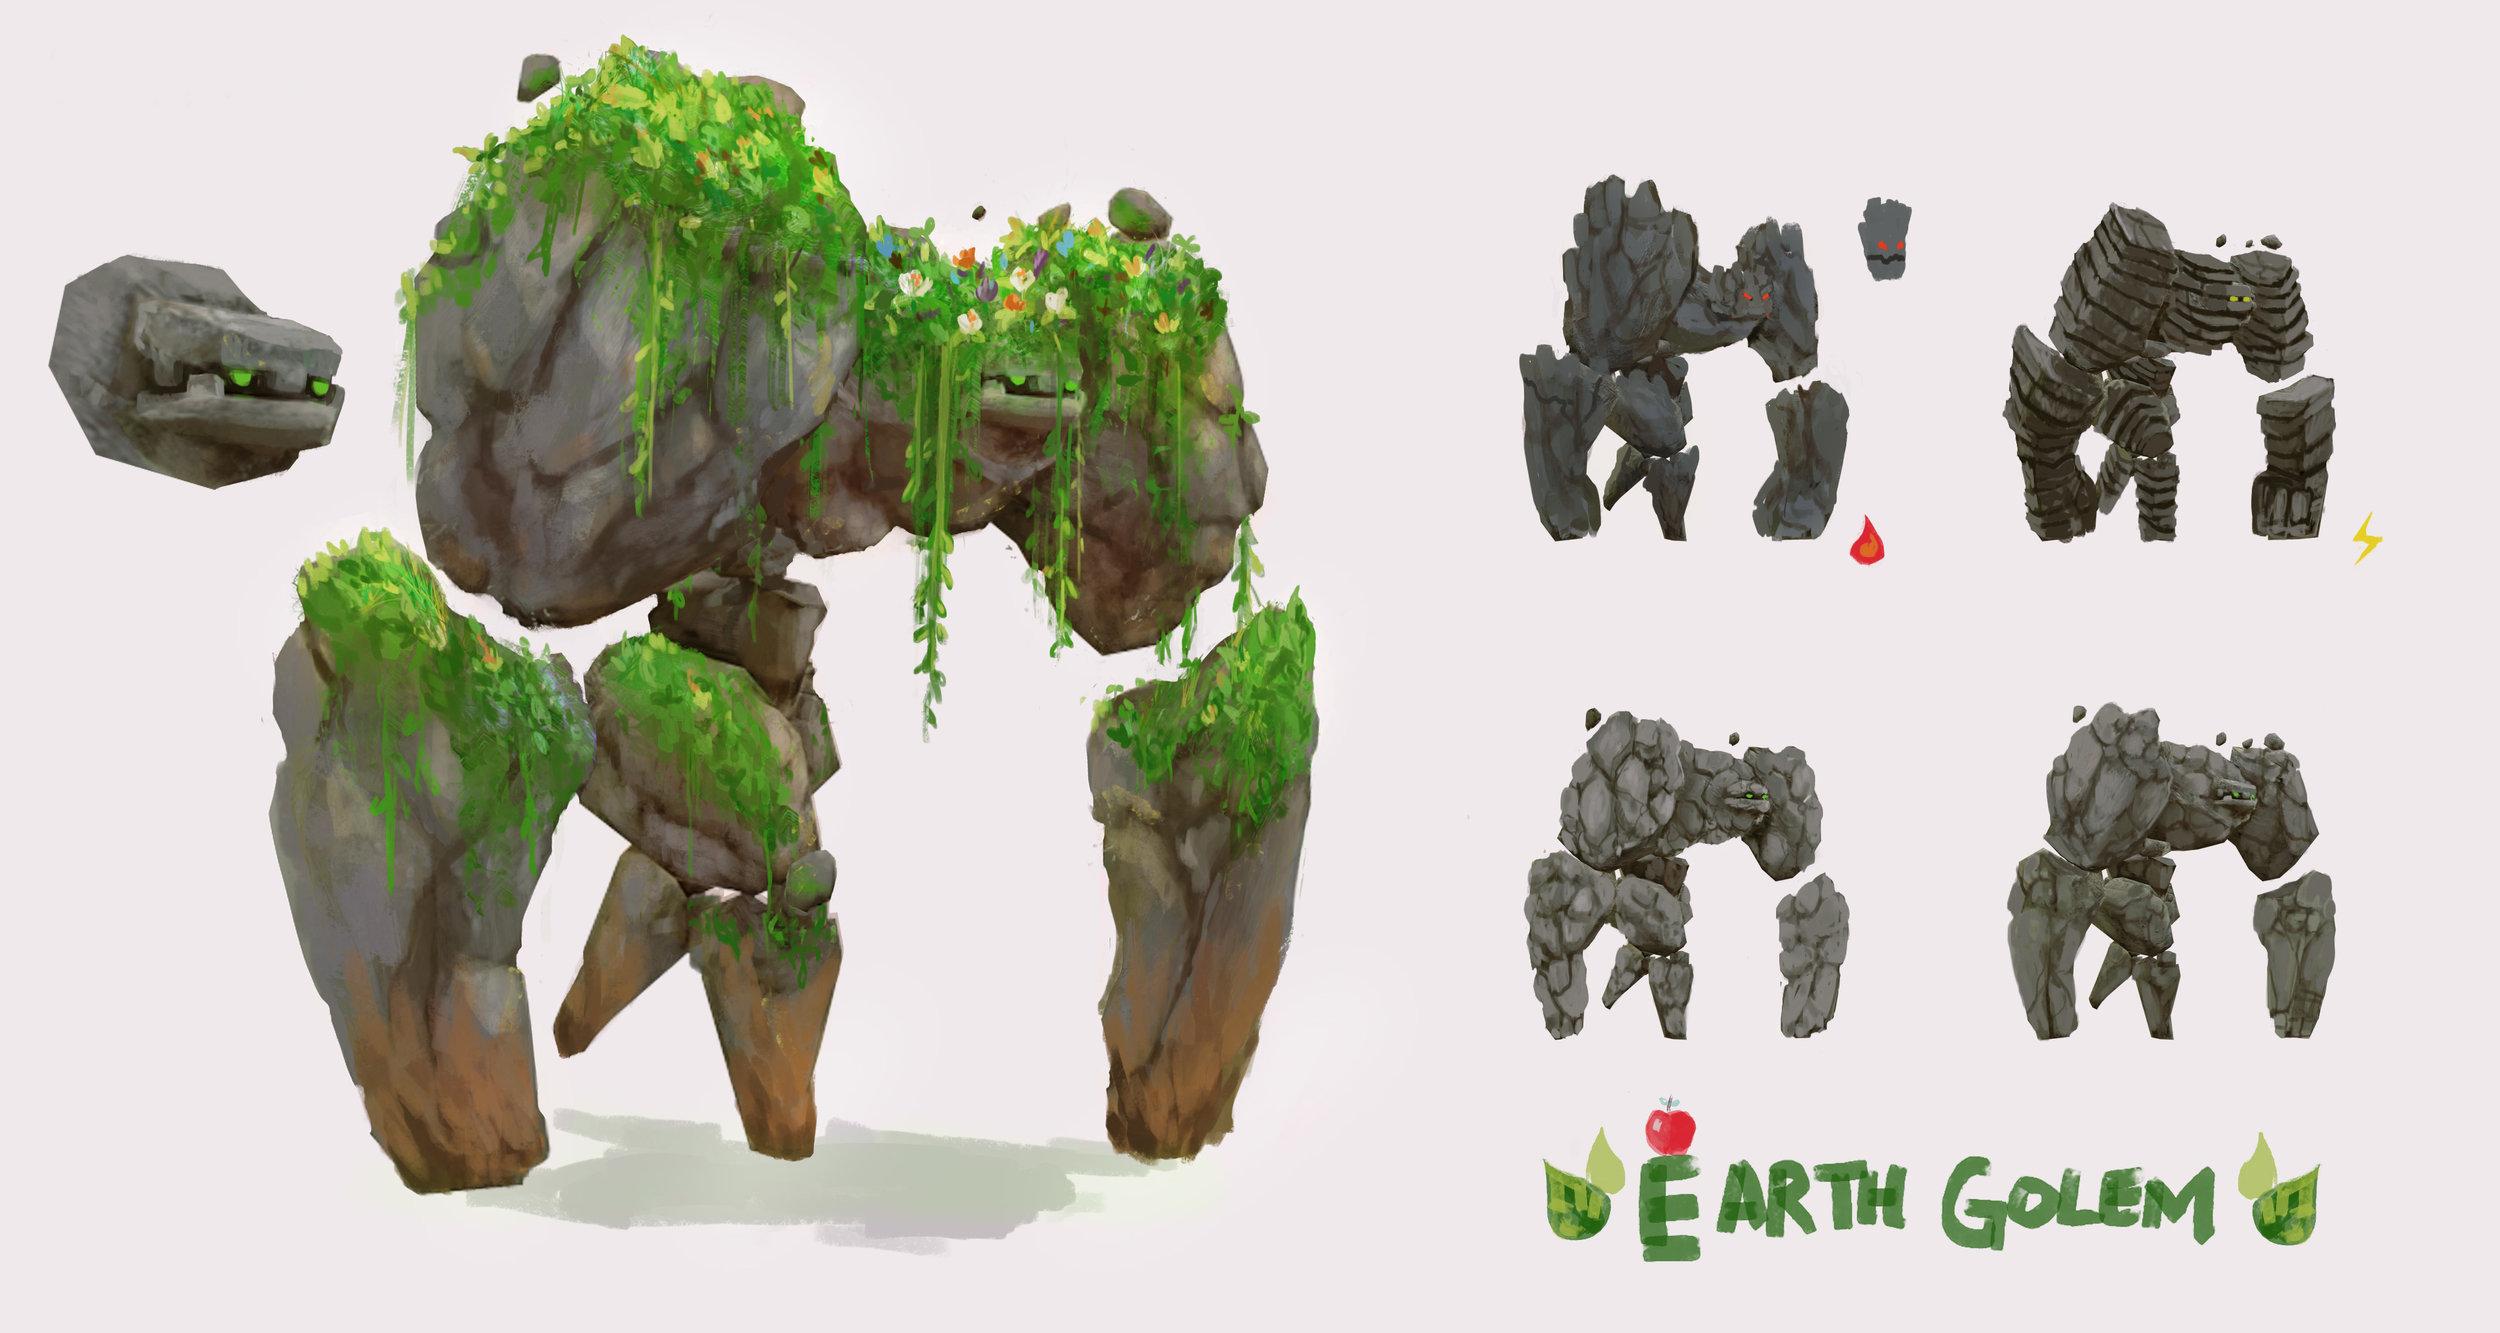 earth_golem_concept.jpg